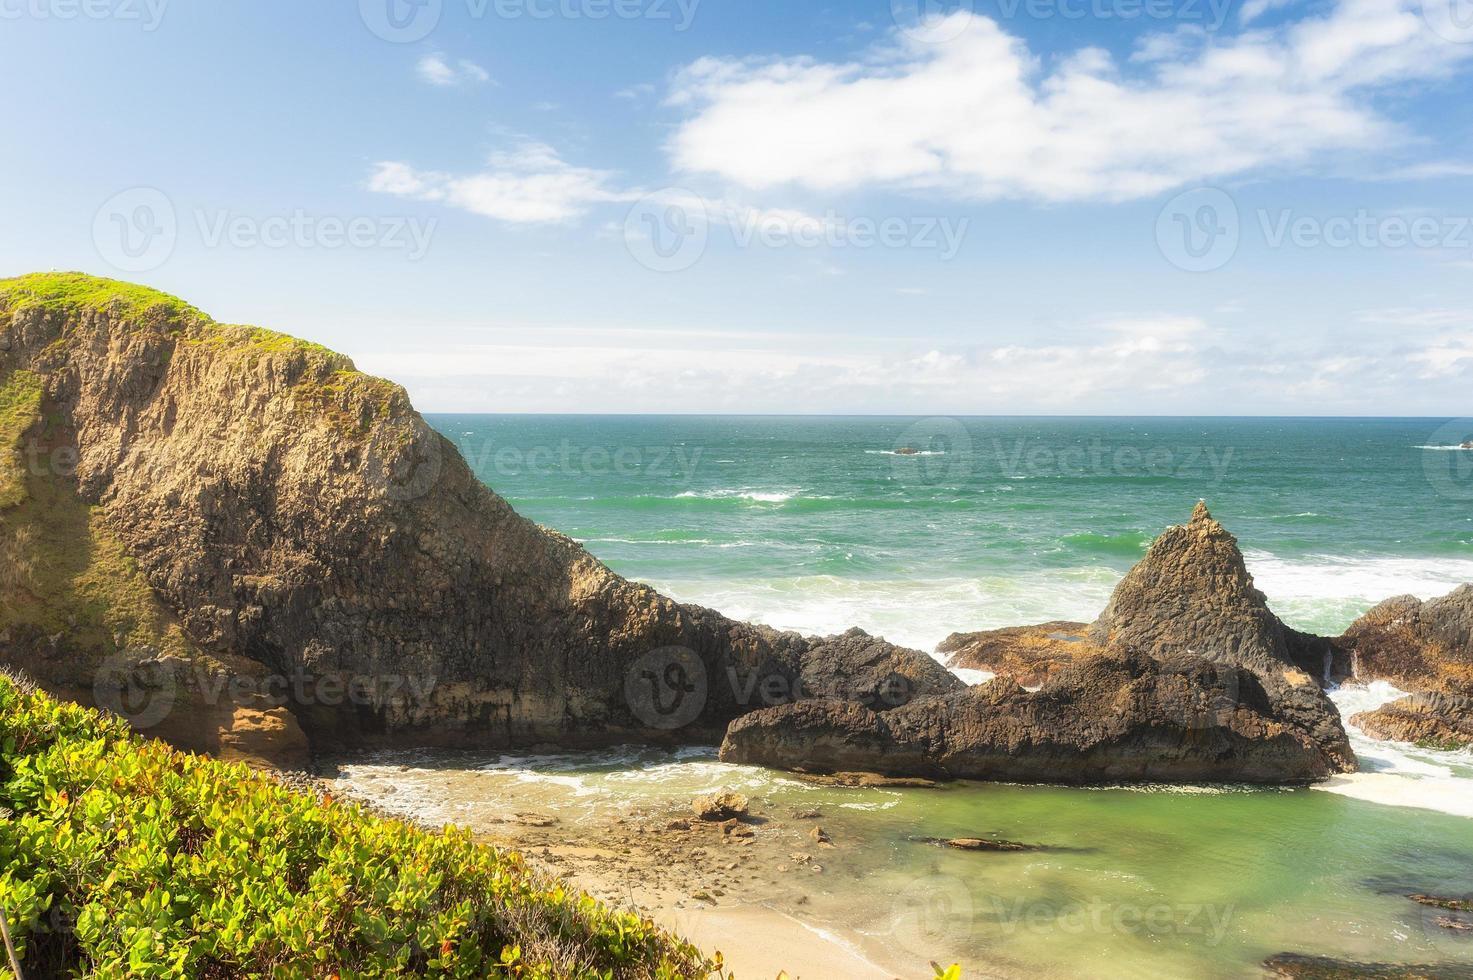 Intertidal Rocks on Seal Rock Beach photo